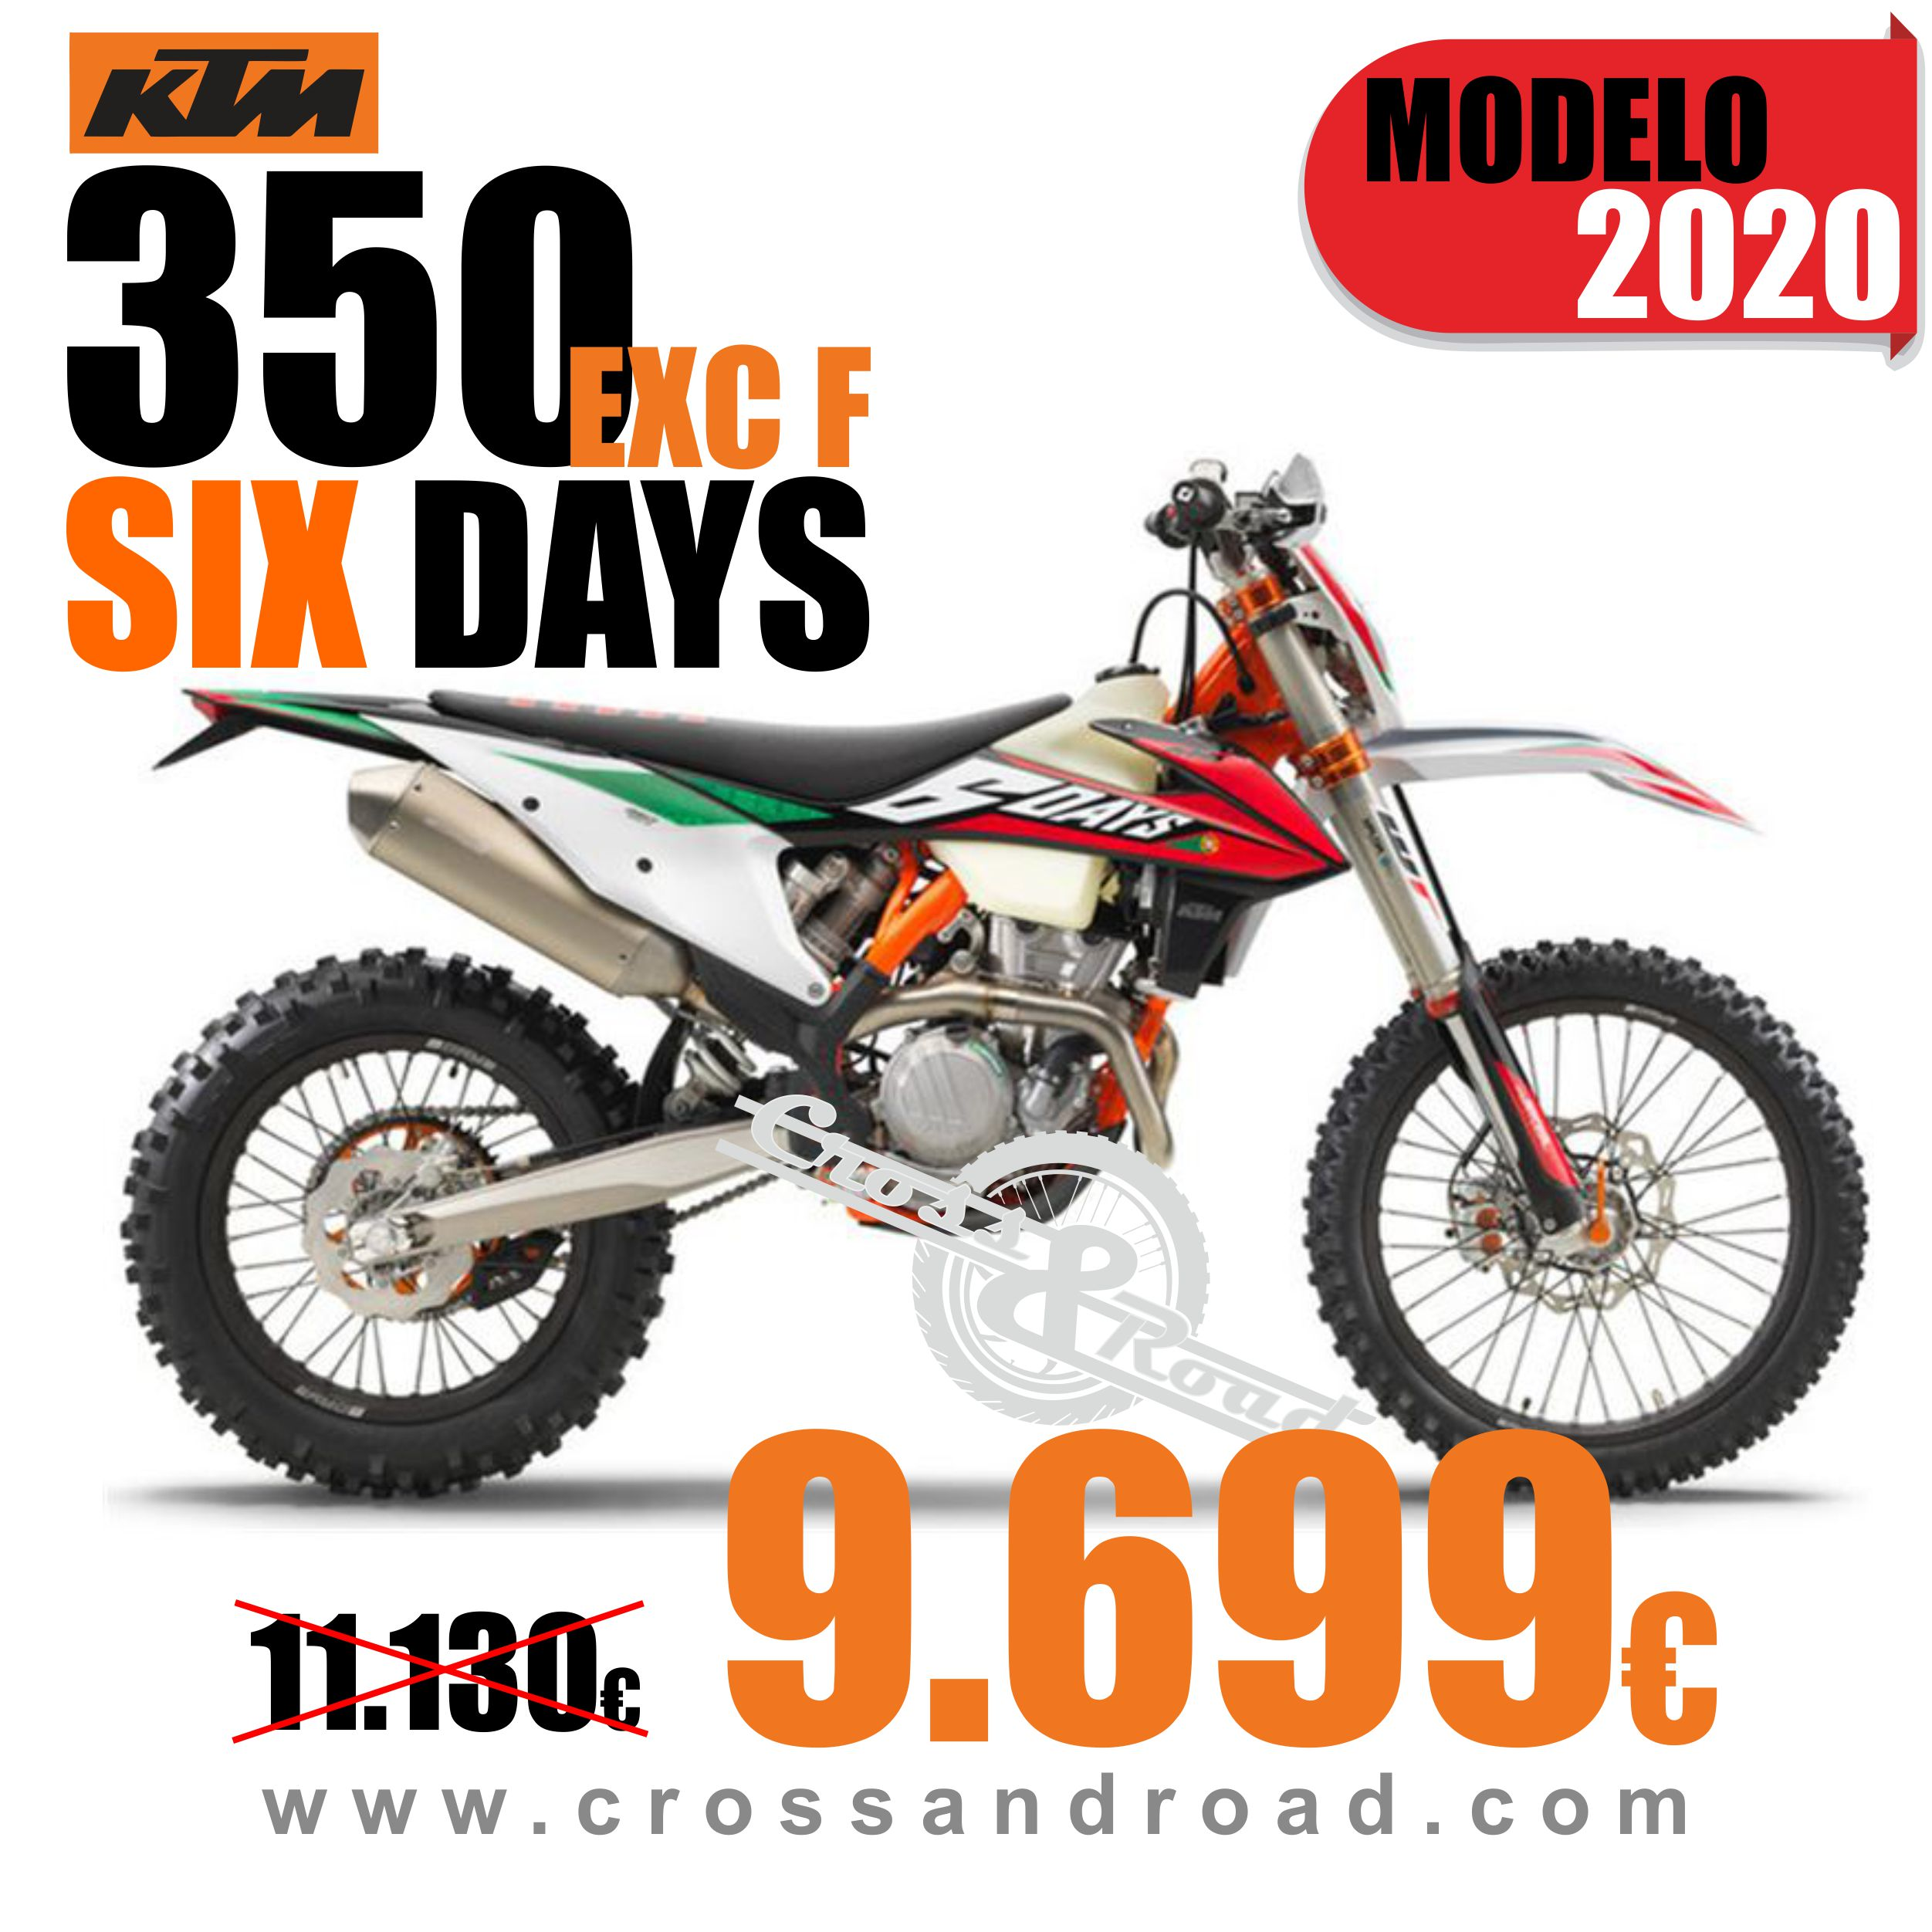 OFERTA MOCICLETA KTM 350 EXC F SIX DAYS (Mod 2020)